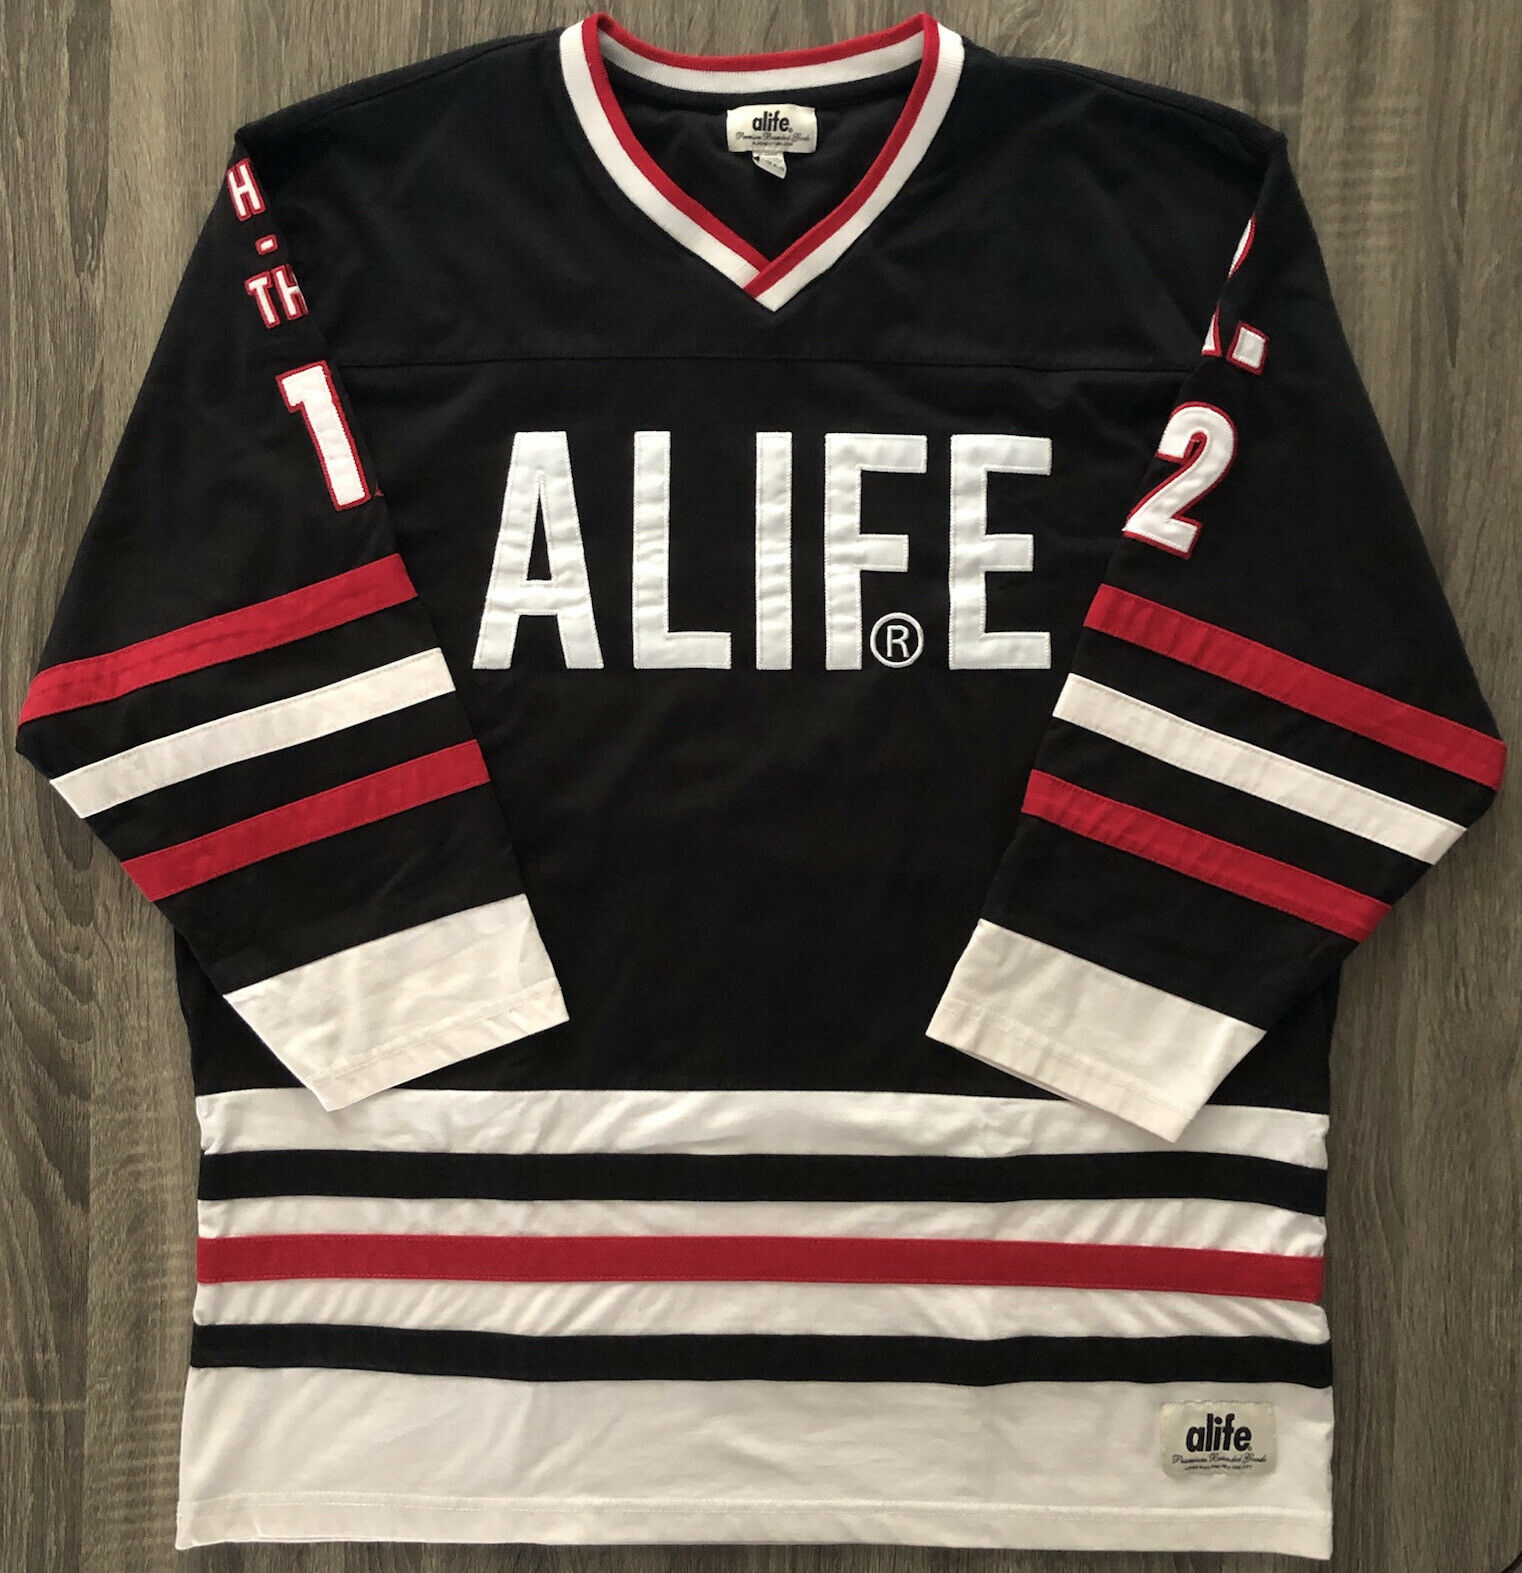 Alife Men's Kels Hockey Jersey #12 Hug-A-Thug Size XL Black/White/Red